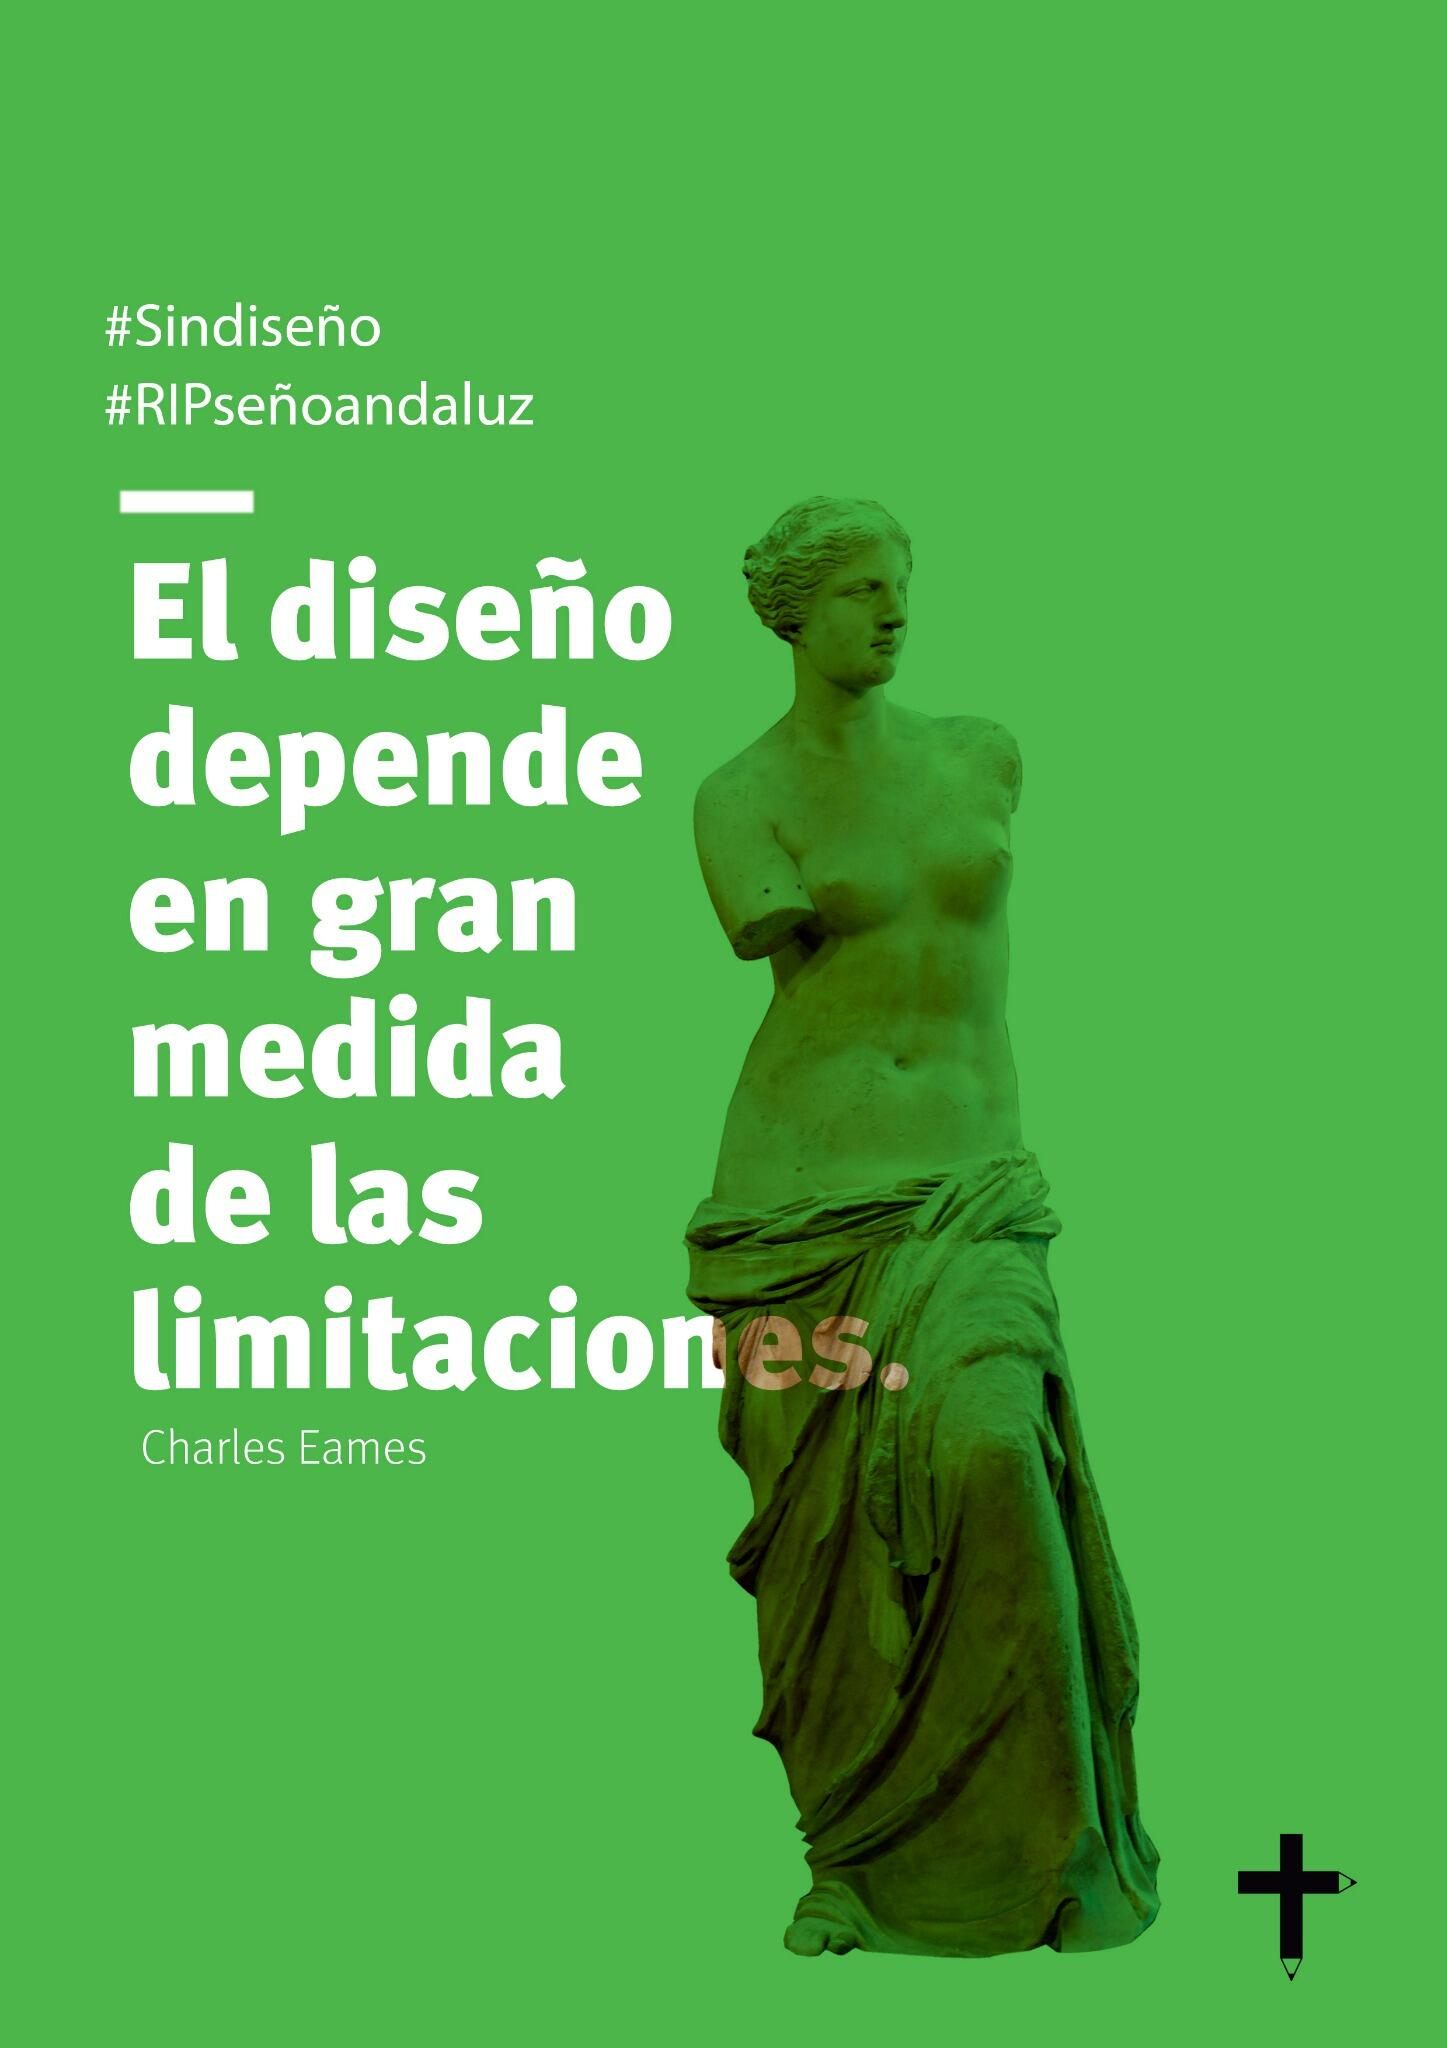 RT @jlbreell: Si al diseño gráfico público #RIPsenoandaluz #sindiseno #EsDiseñoJerez http://t.co/J7jWcNzJMO